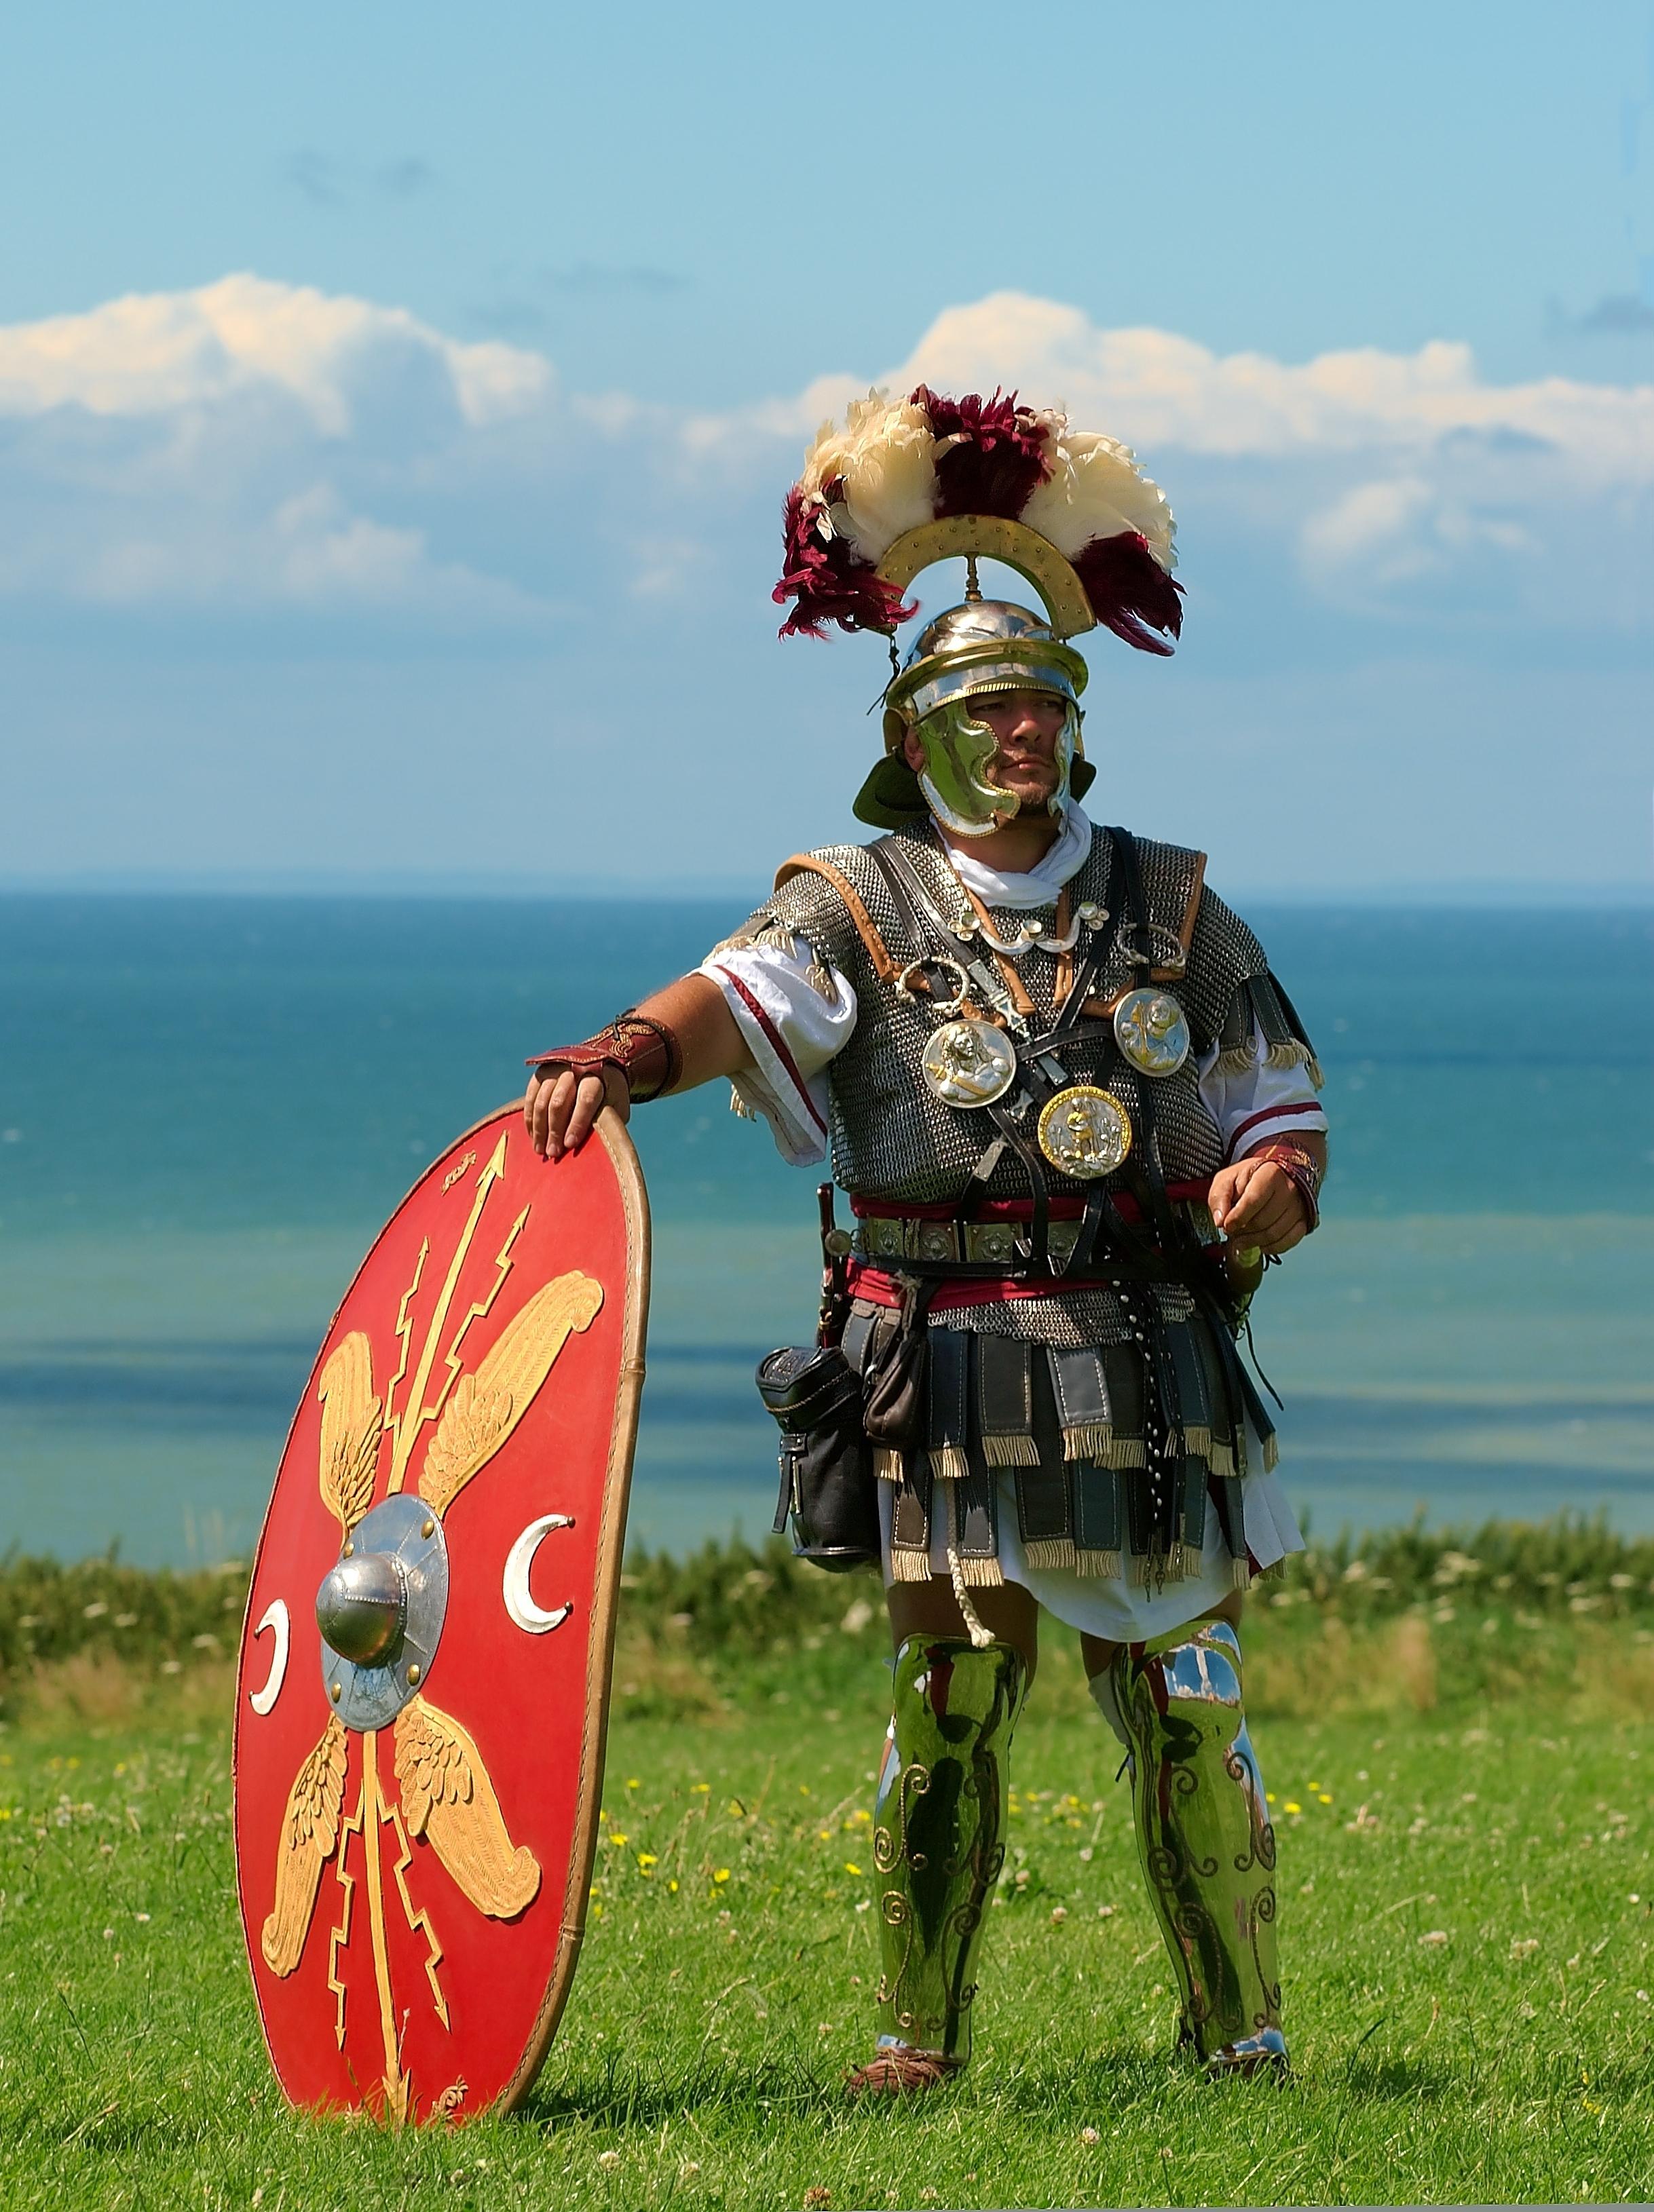 Roman Centurion (Re-enactment), Wikipedia